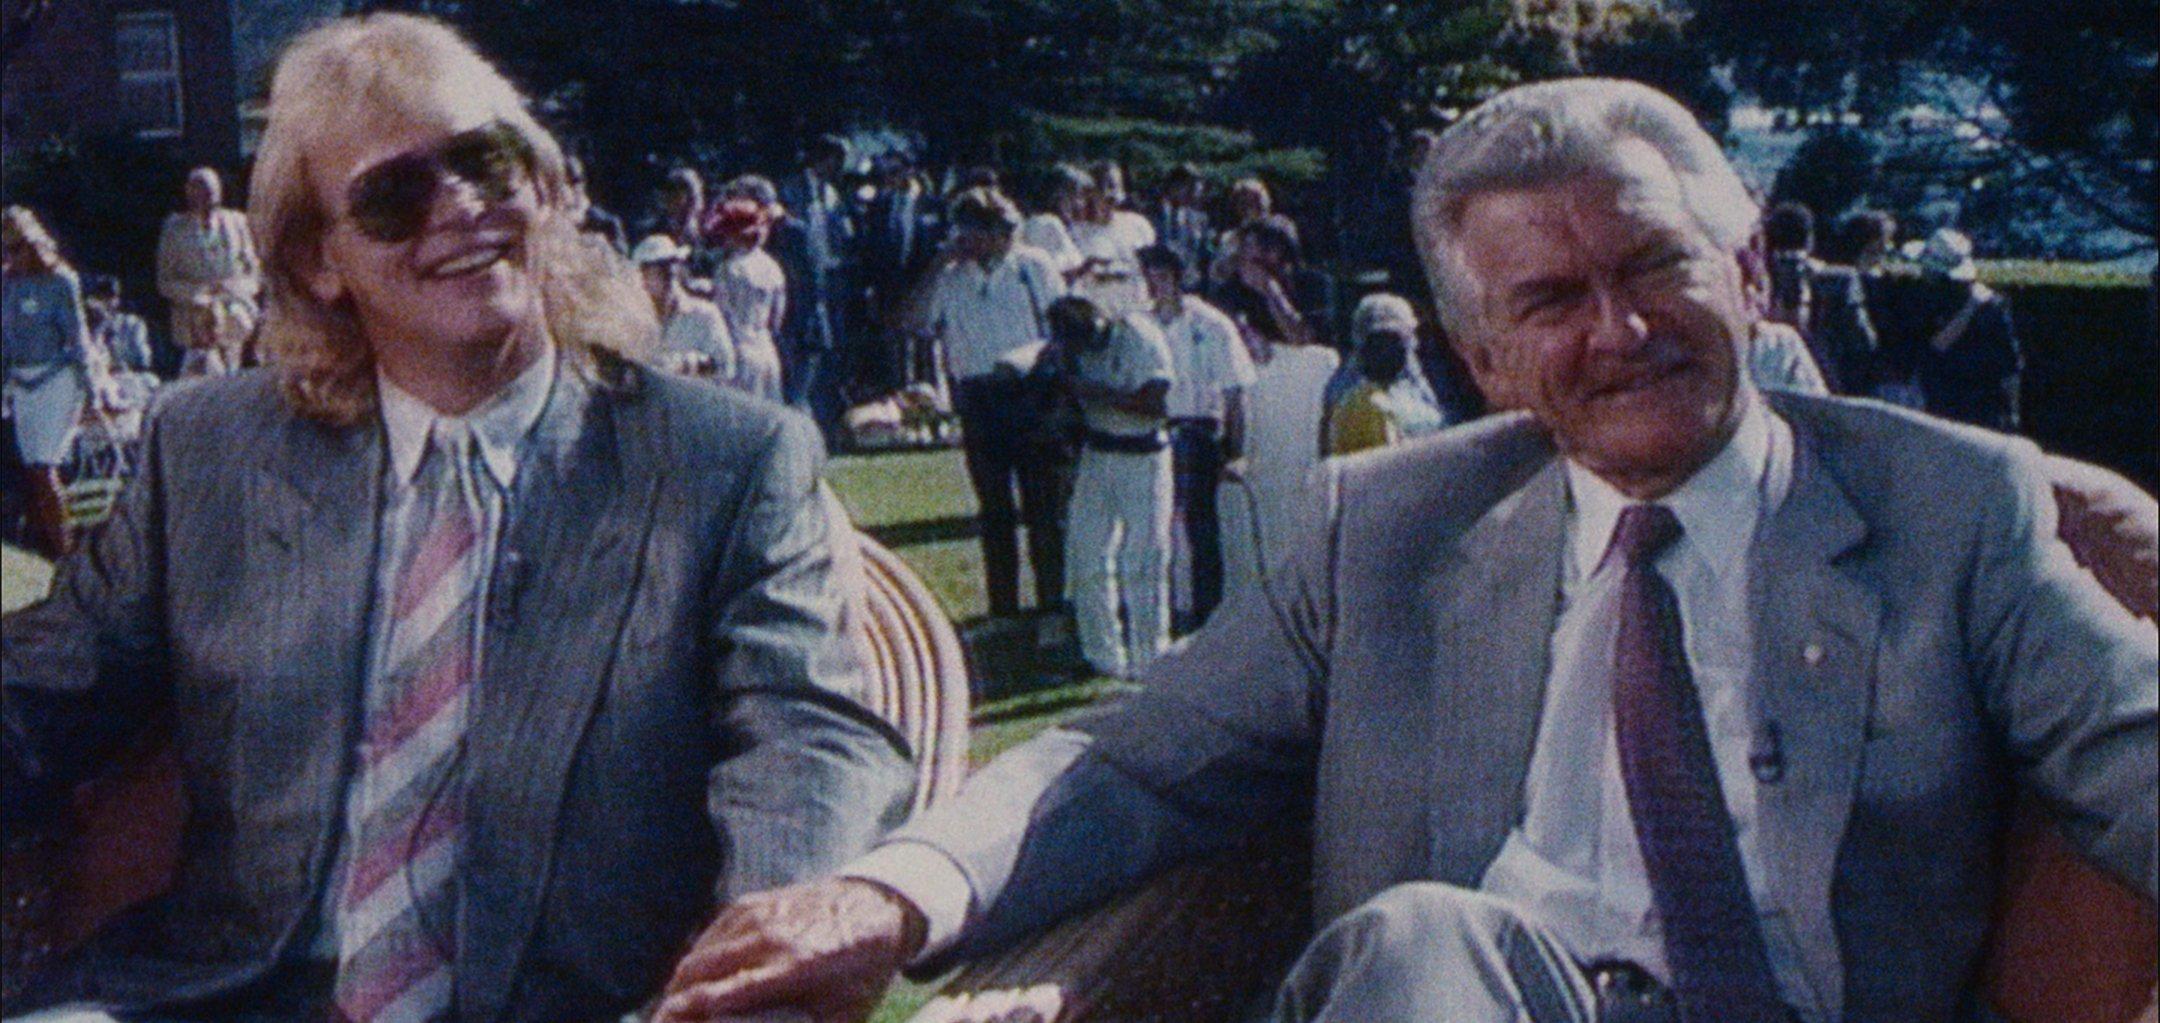 John Farnham & Bob Hawke appear on 'Good Morning Australia' in 'Australia Daze' (1988)